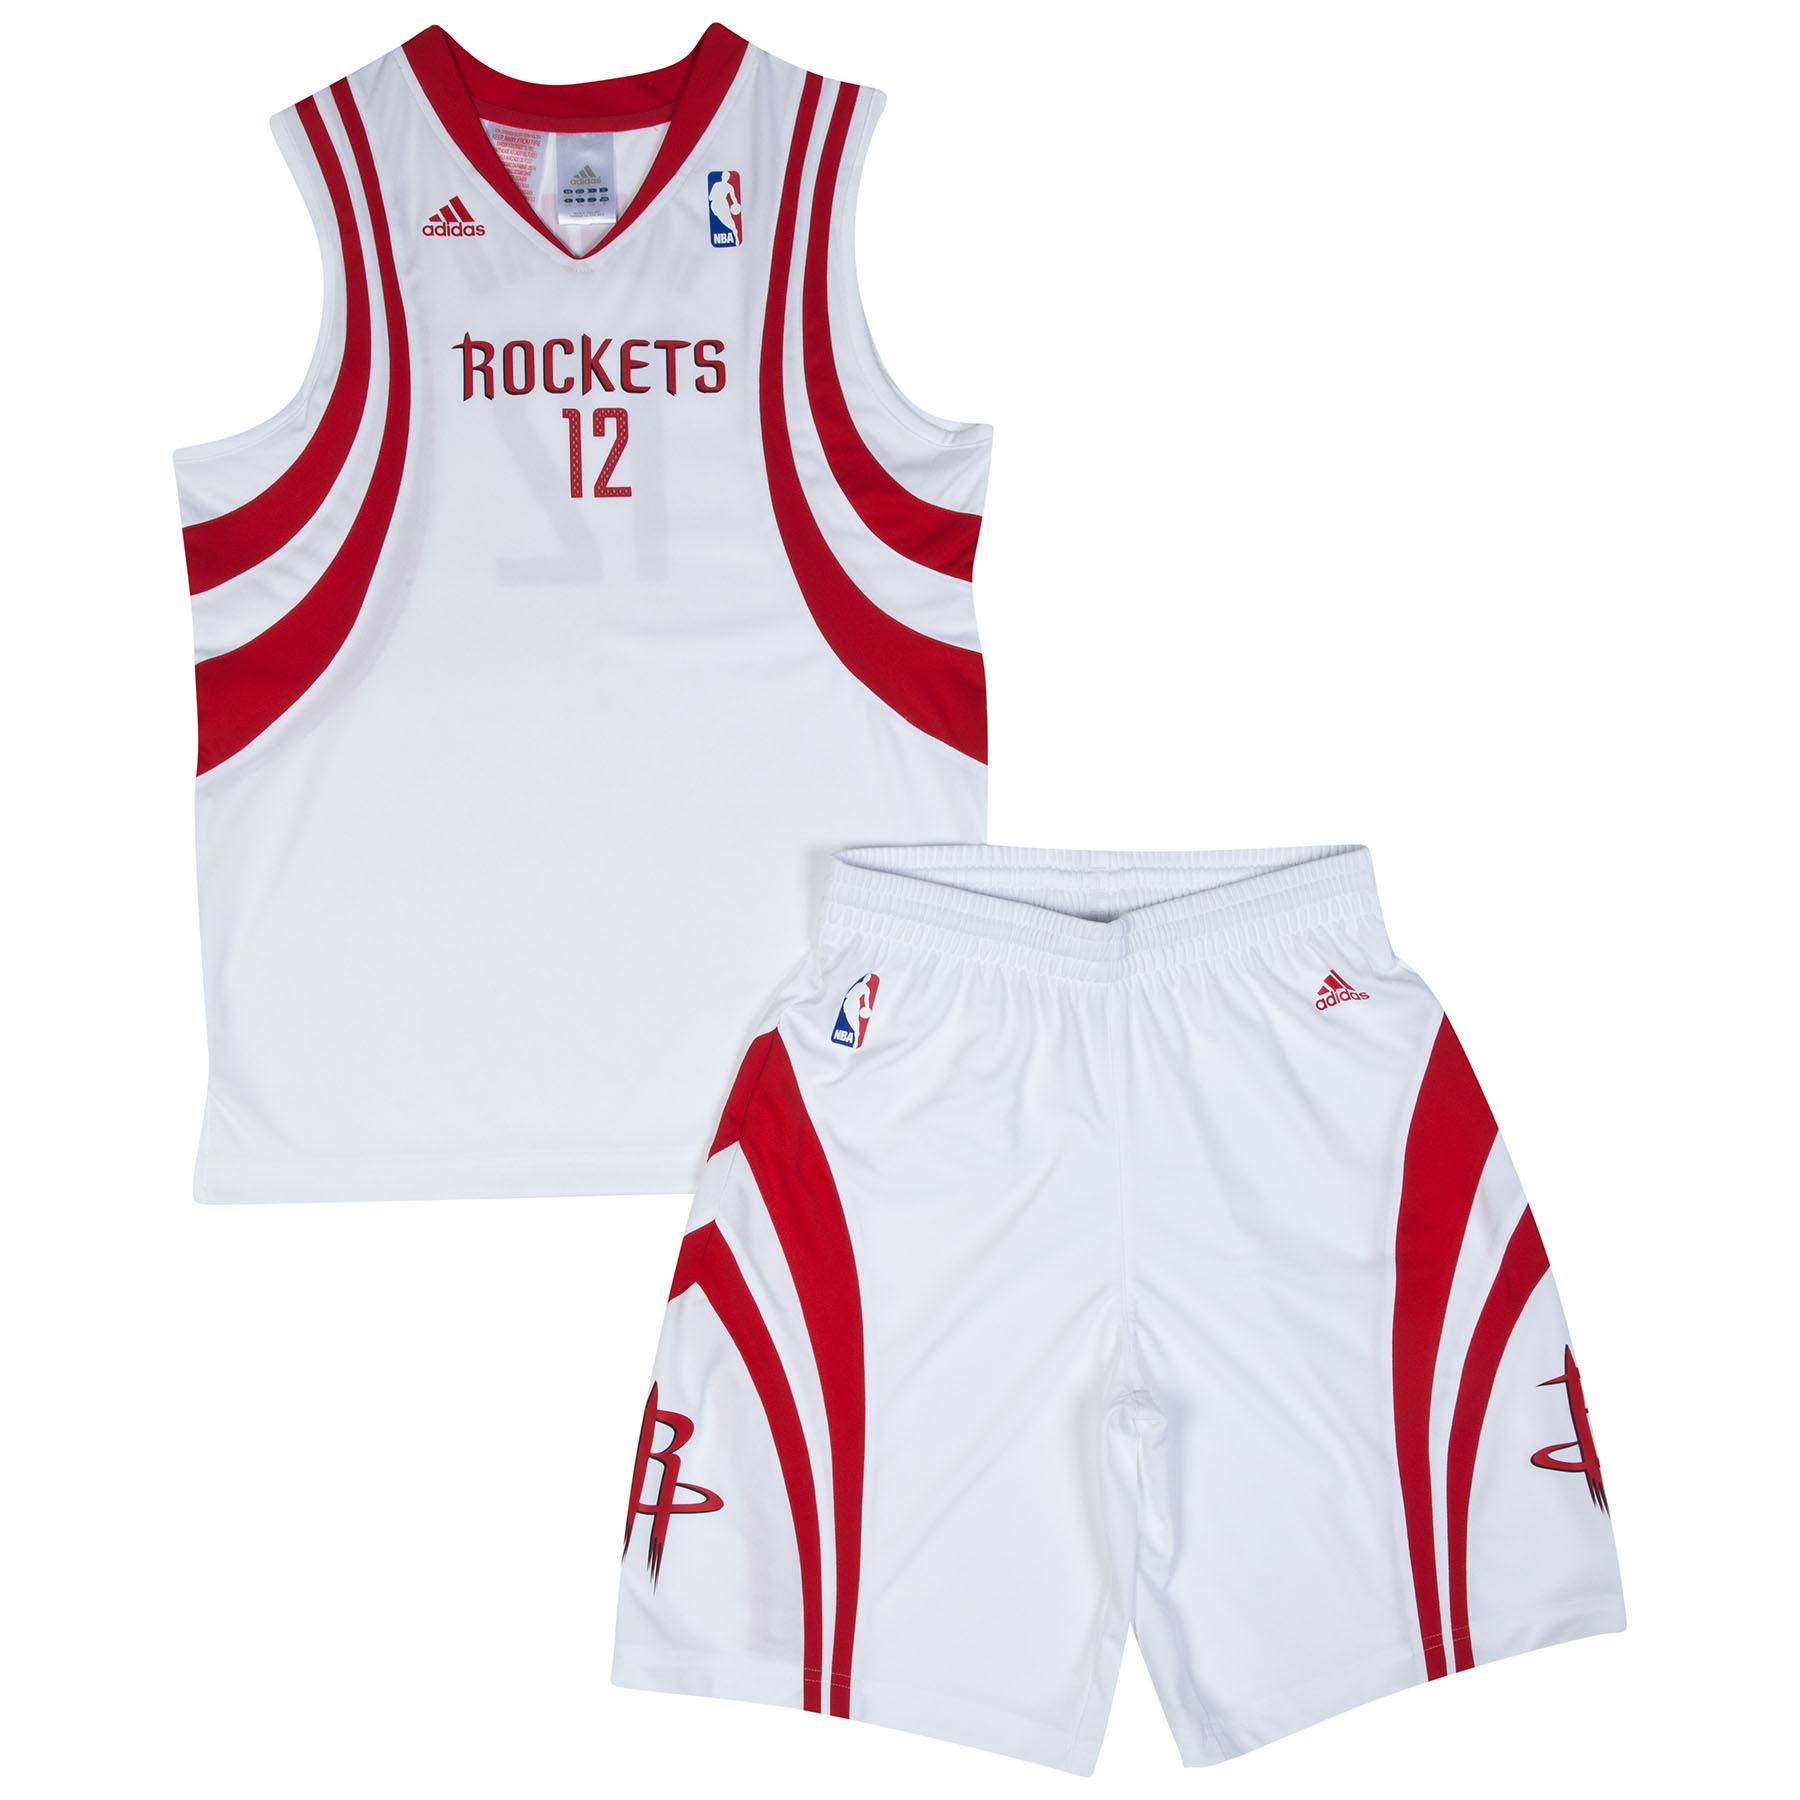 Houston Rockets Home Replica Jersey & Shorts - Dwight Howard - Junior